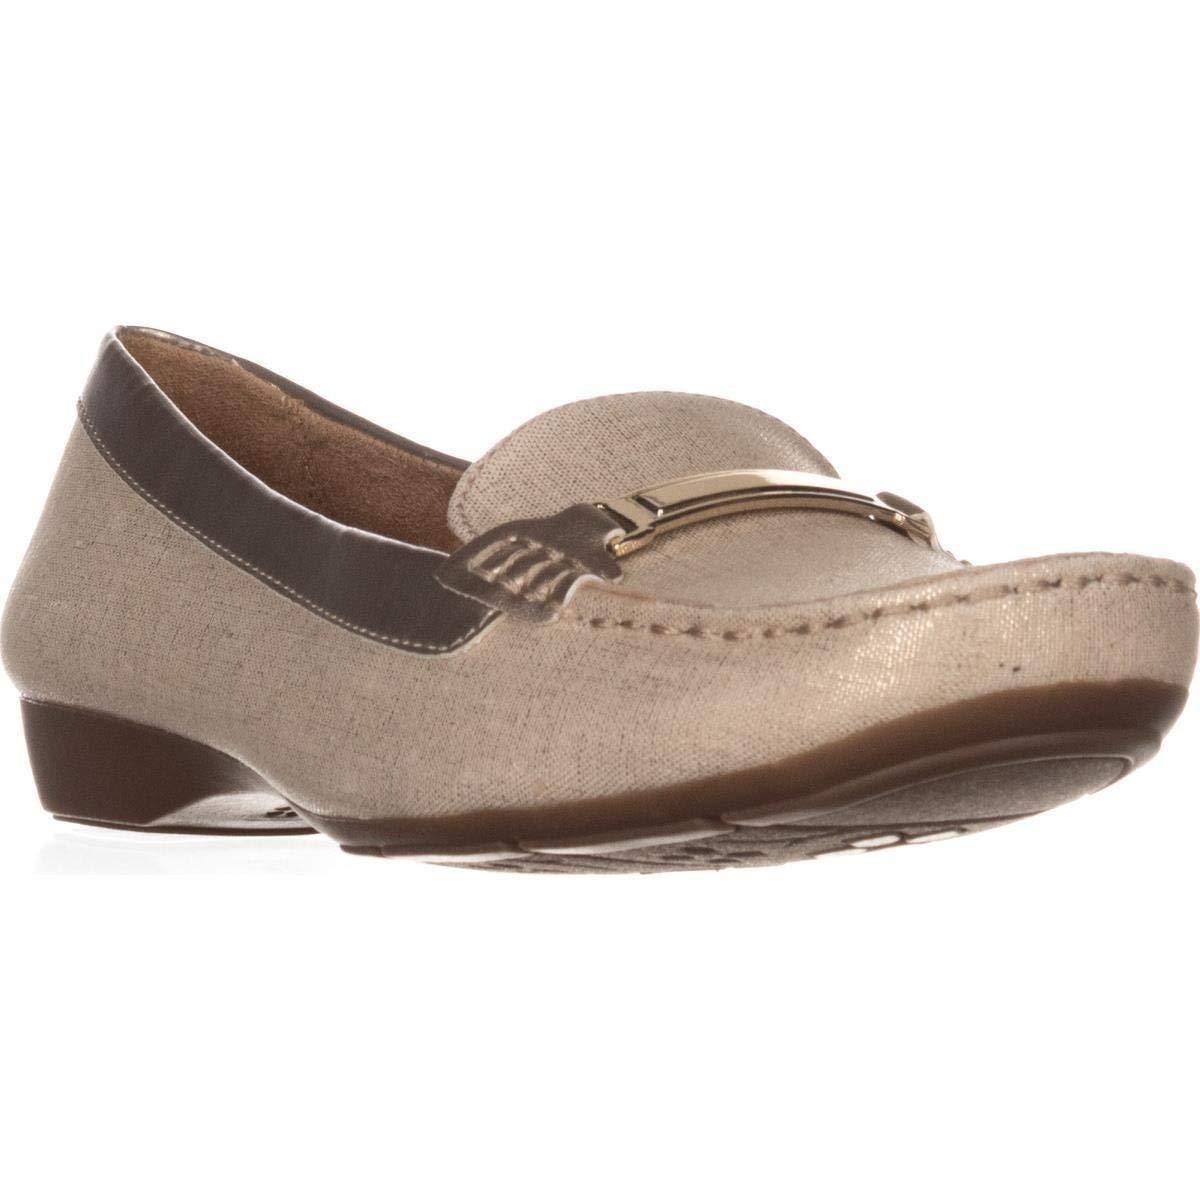 Naturalizer damen Gadget Square Toe Loafers